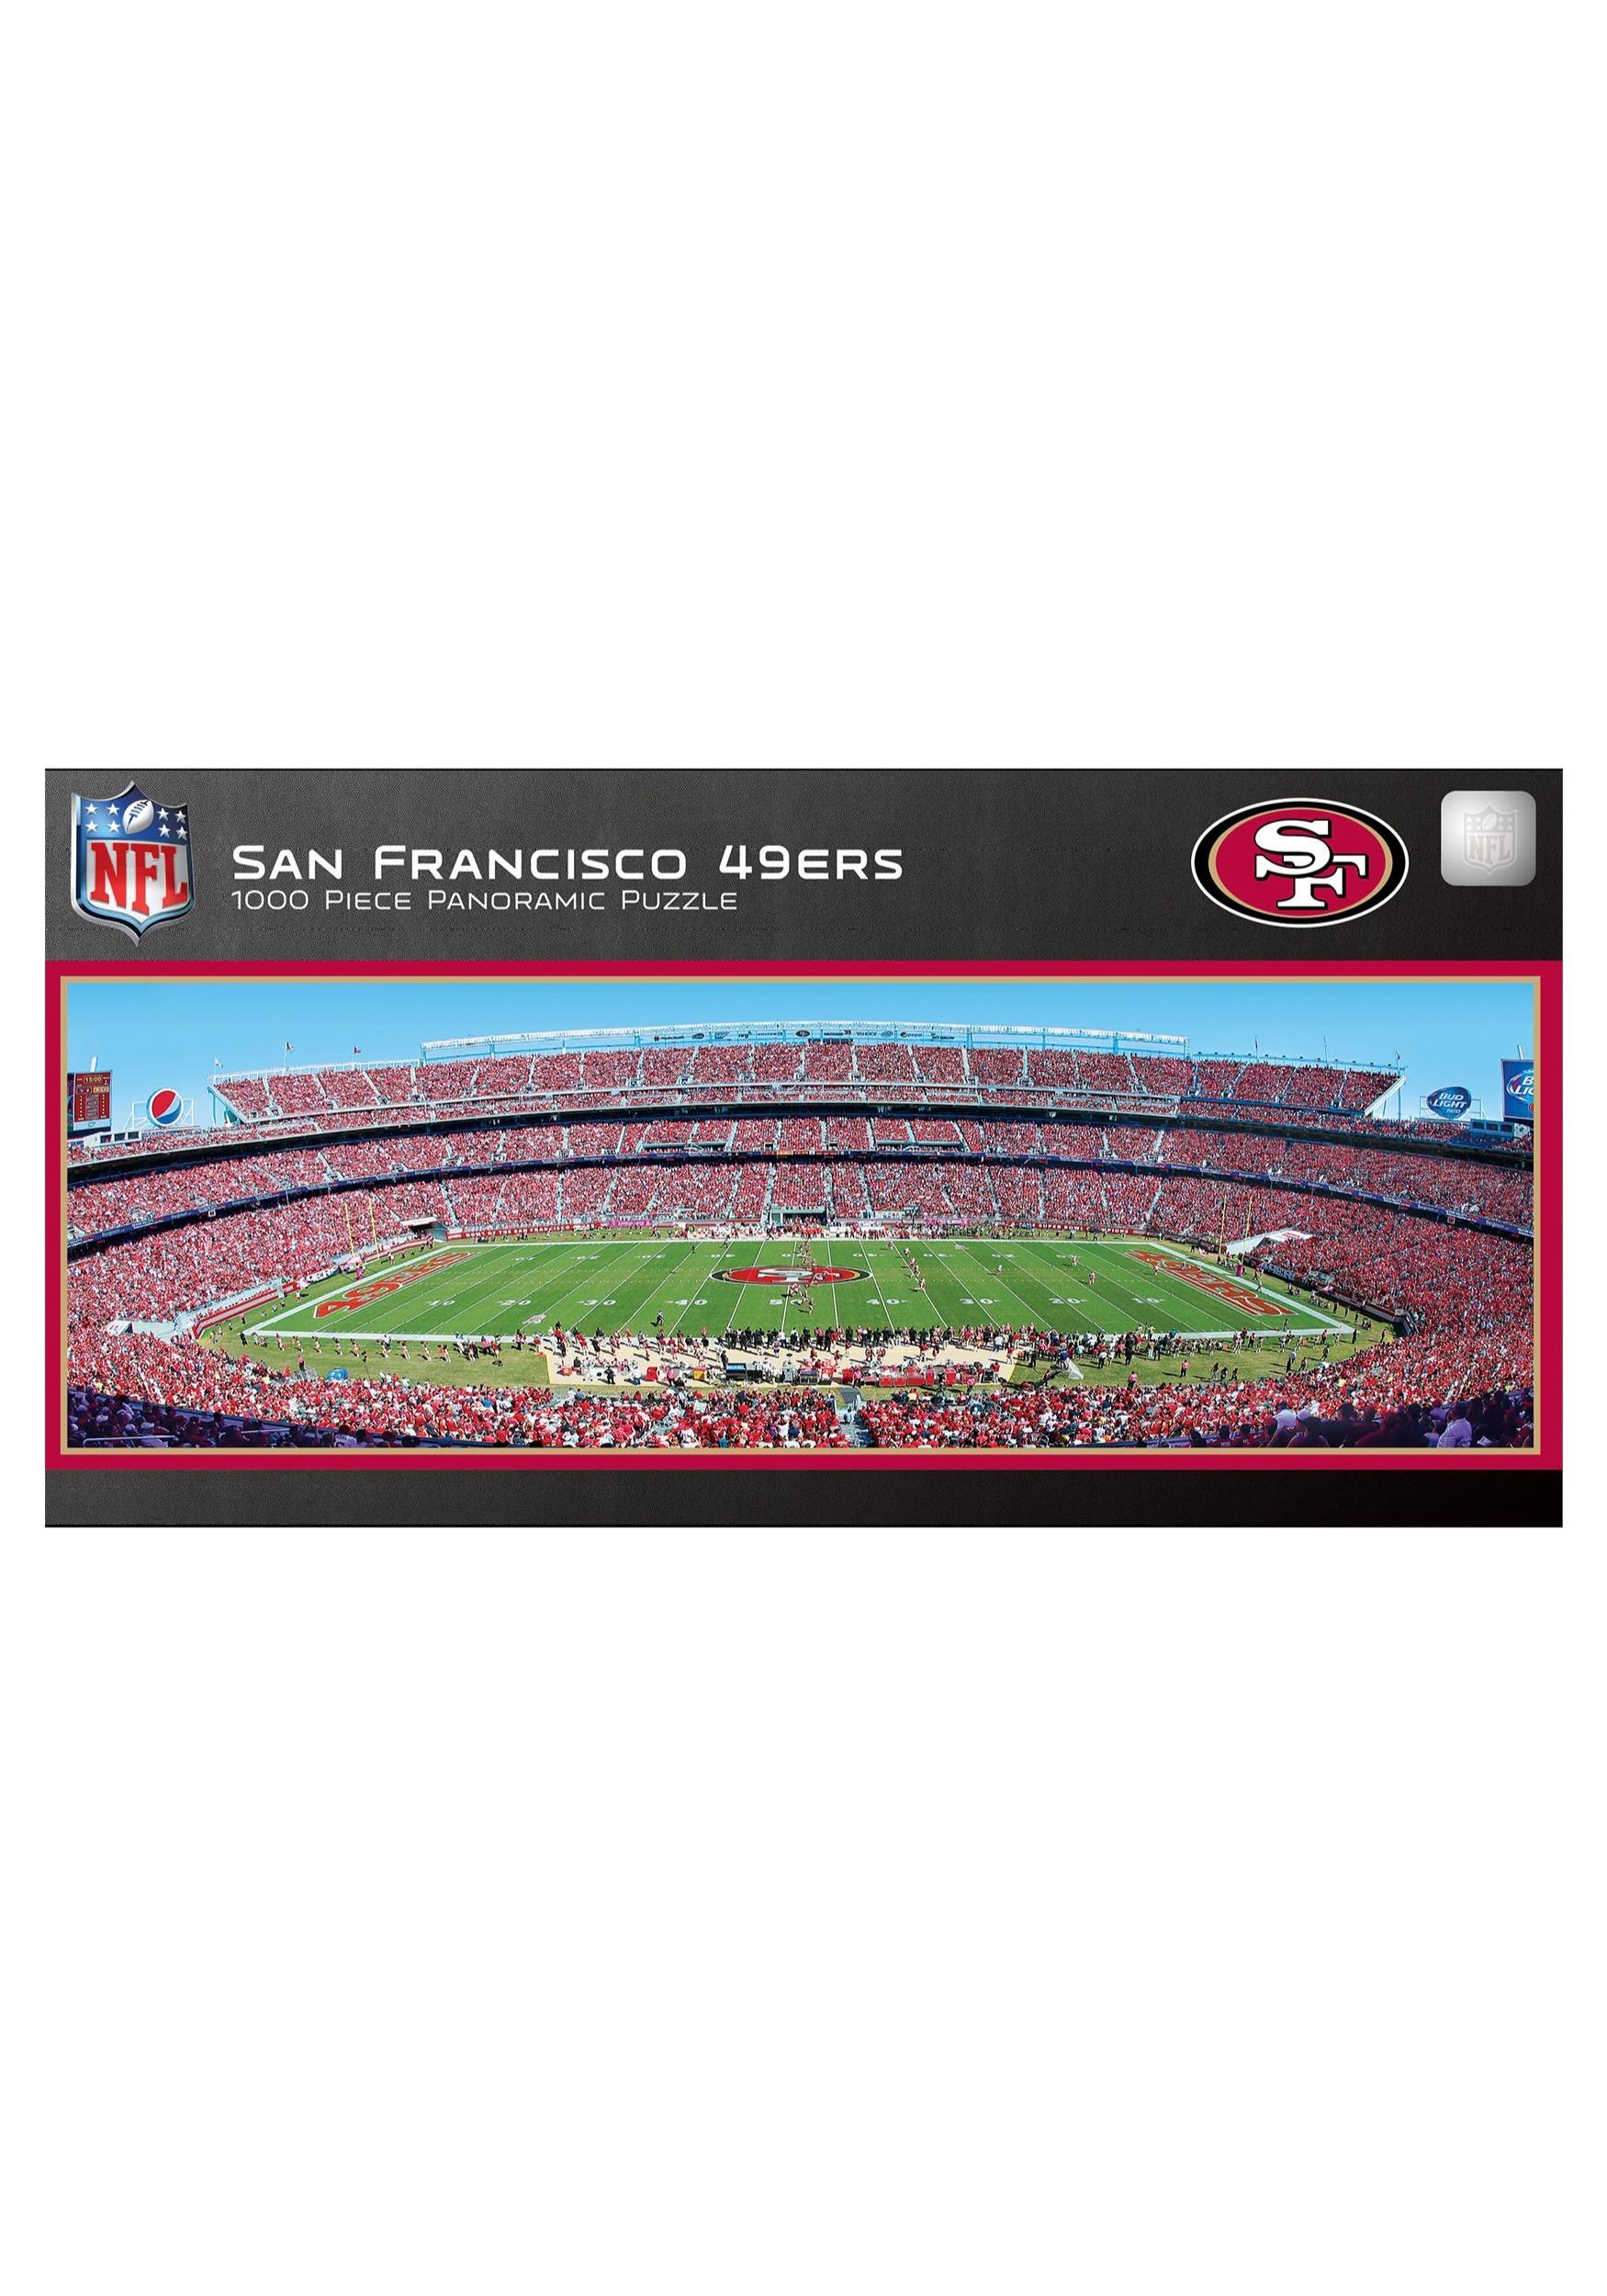 San Francisco 49ers NFL 1000 Piece Stadium Puzzle